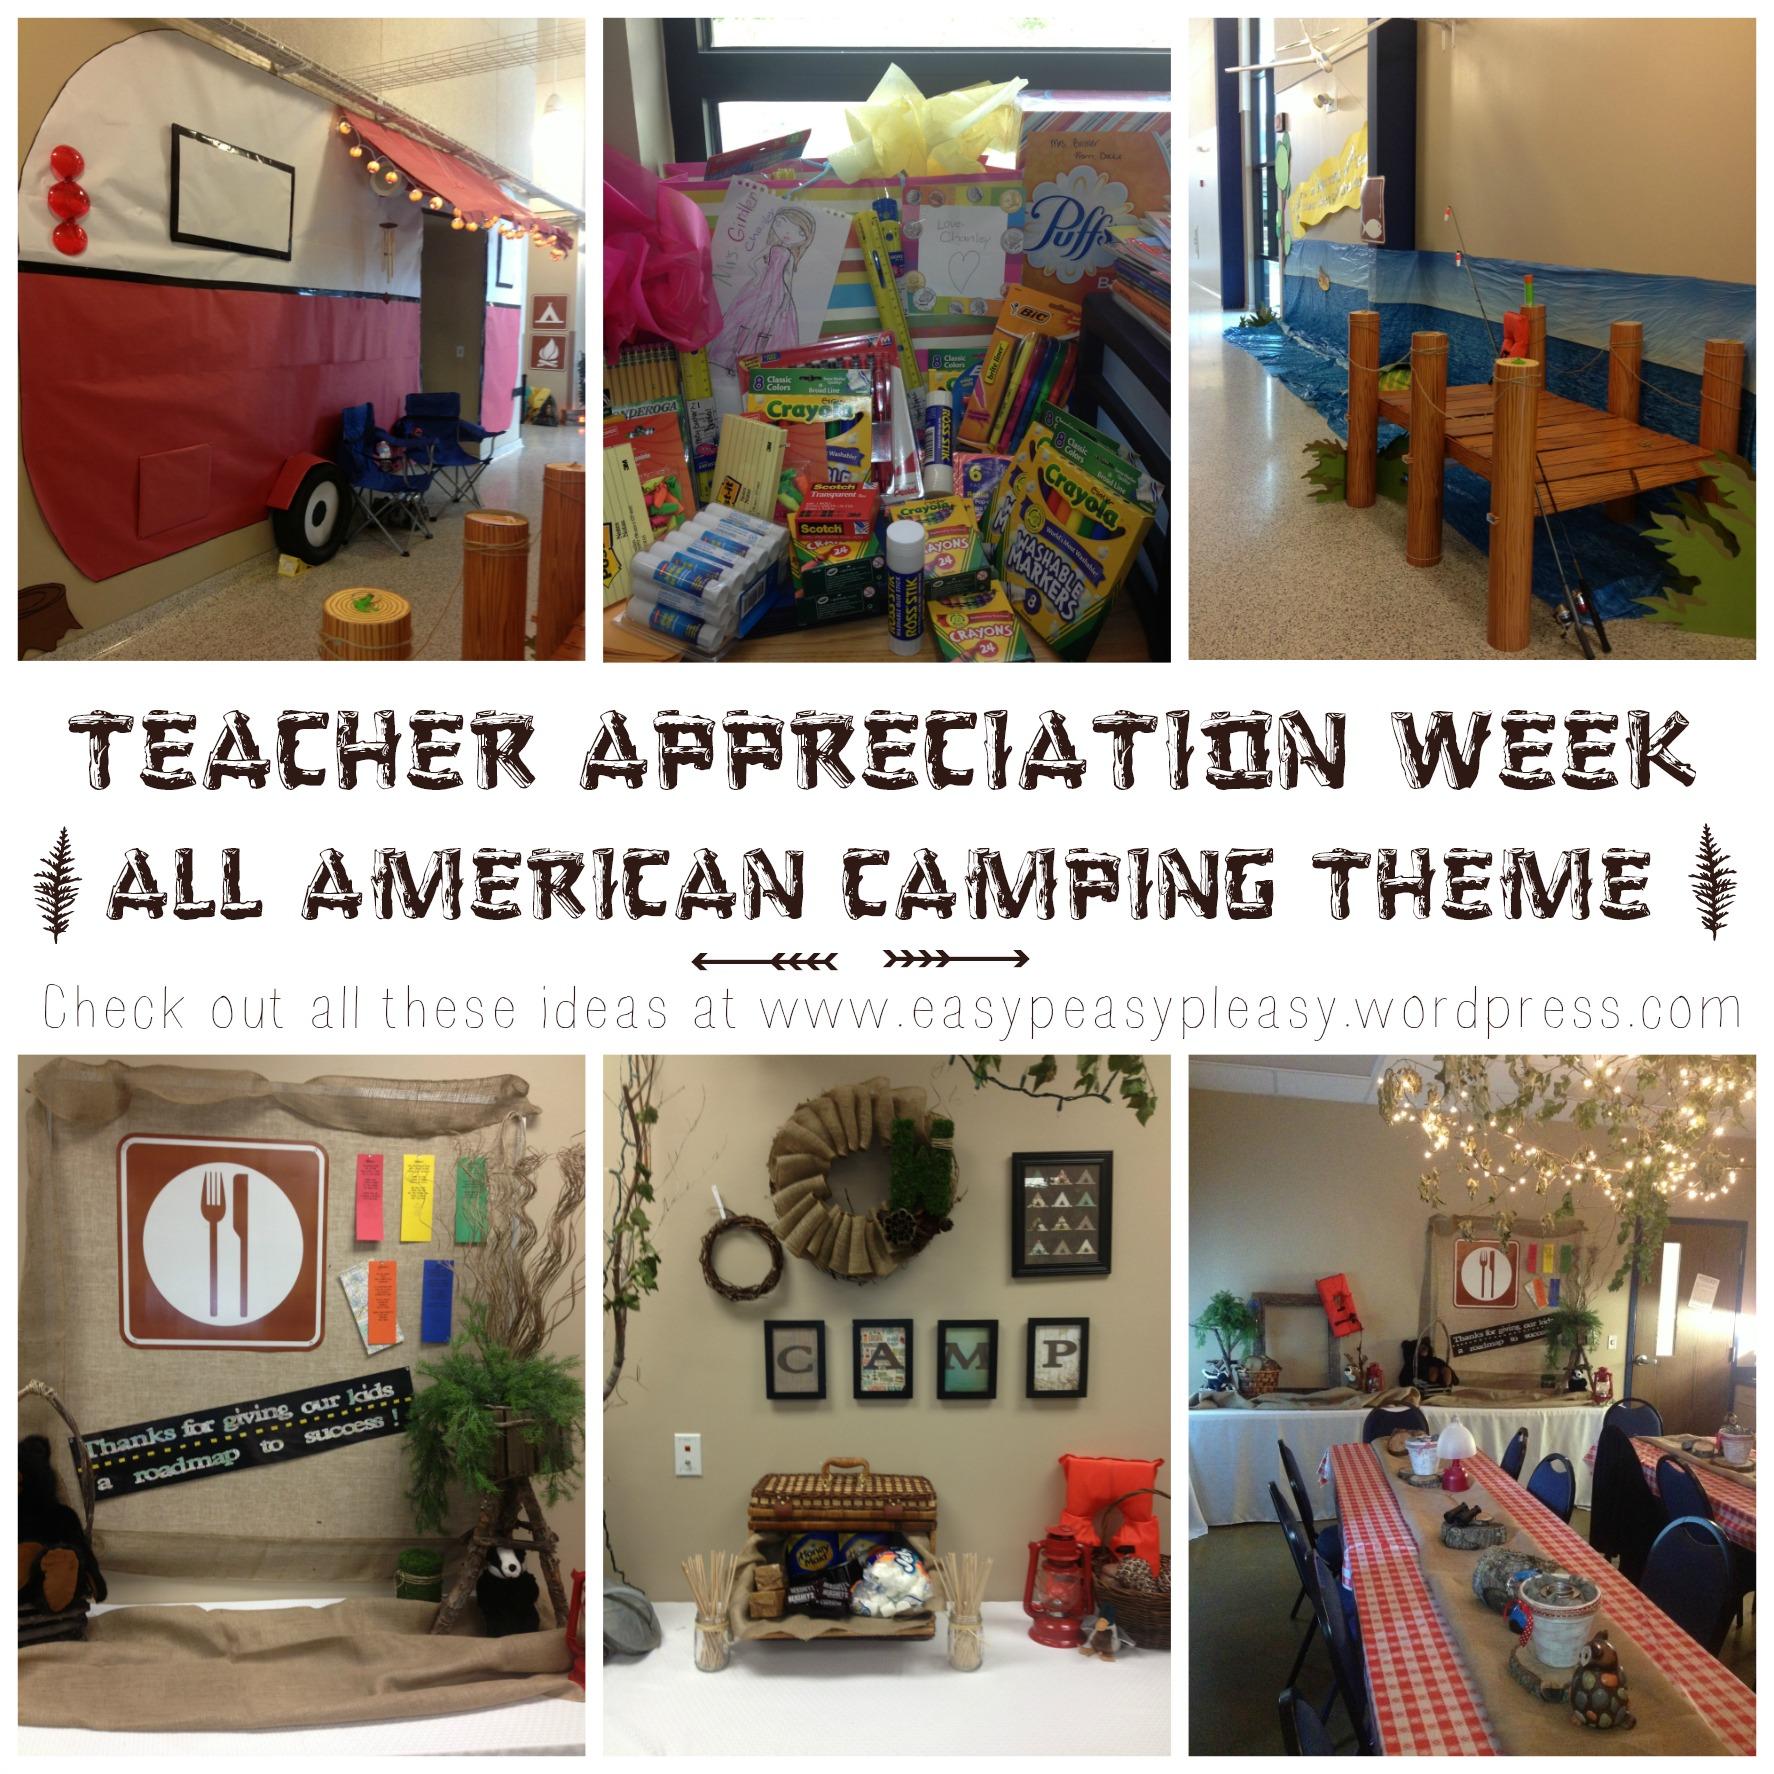 How To Show Teacher Appreciation In A Big Way!